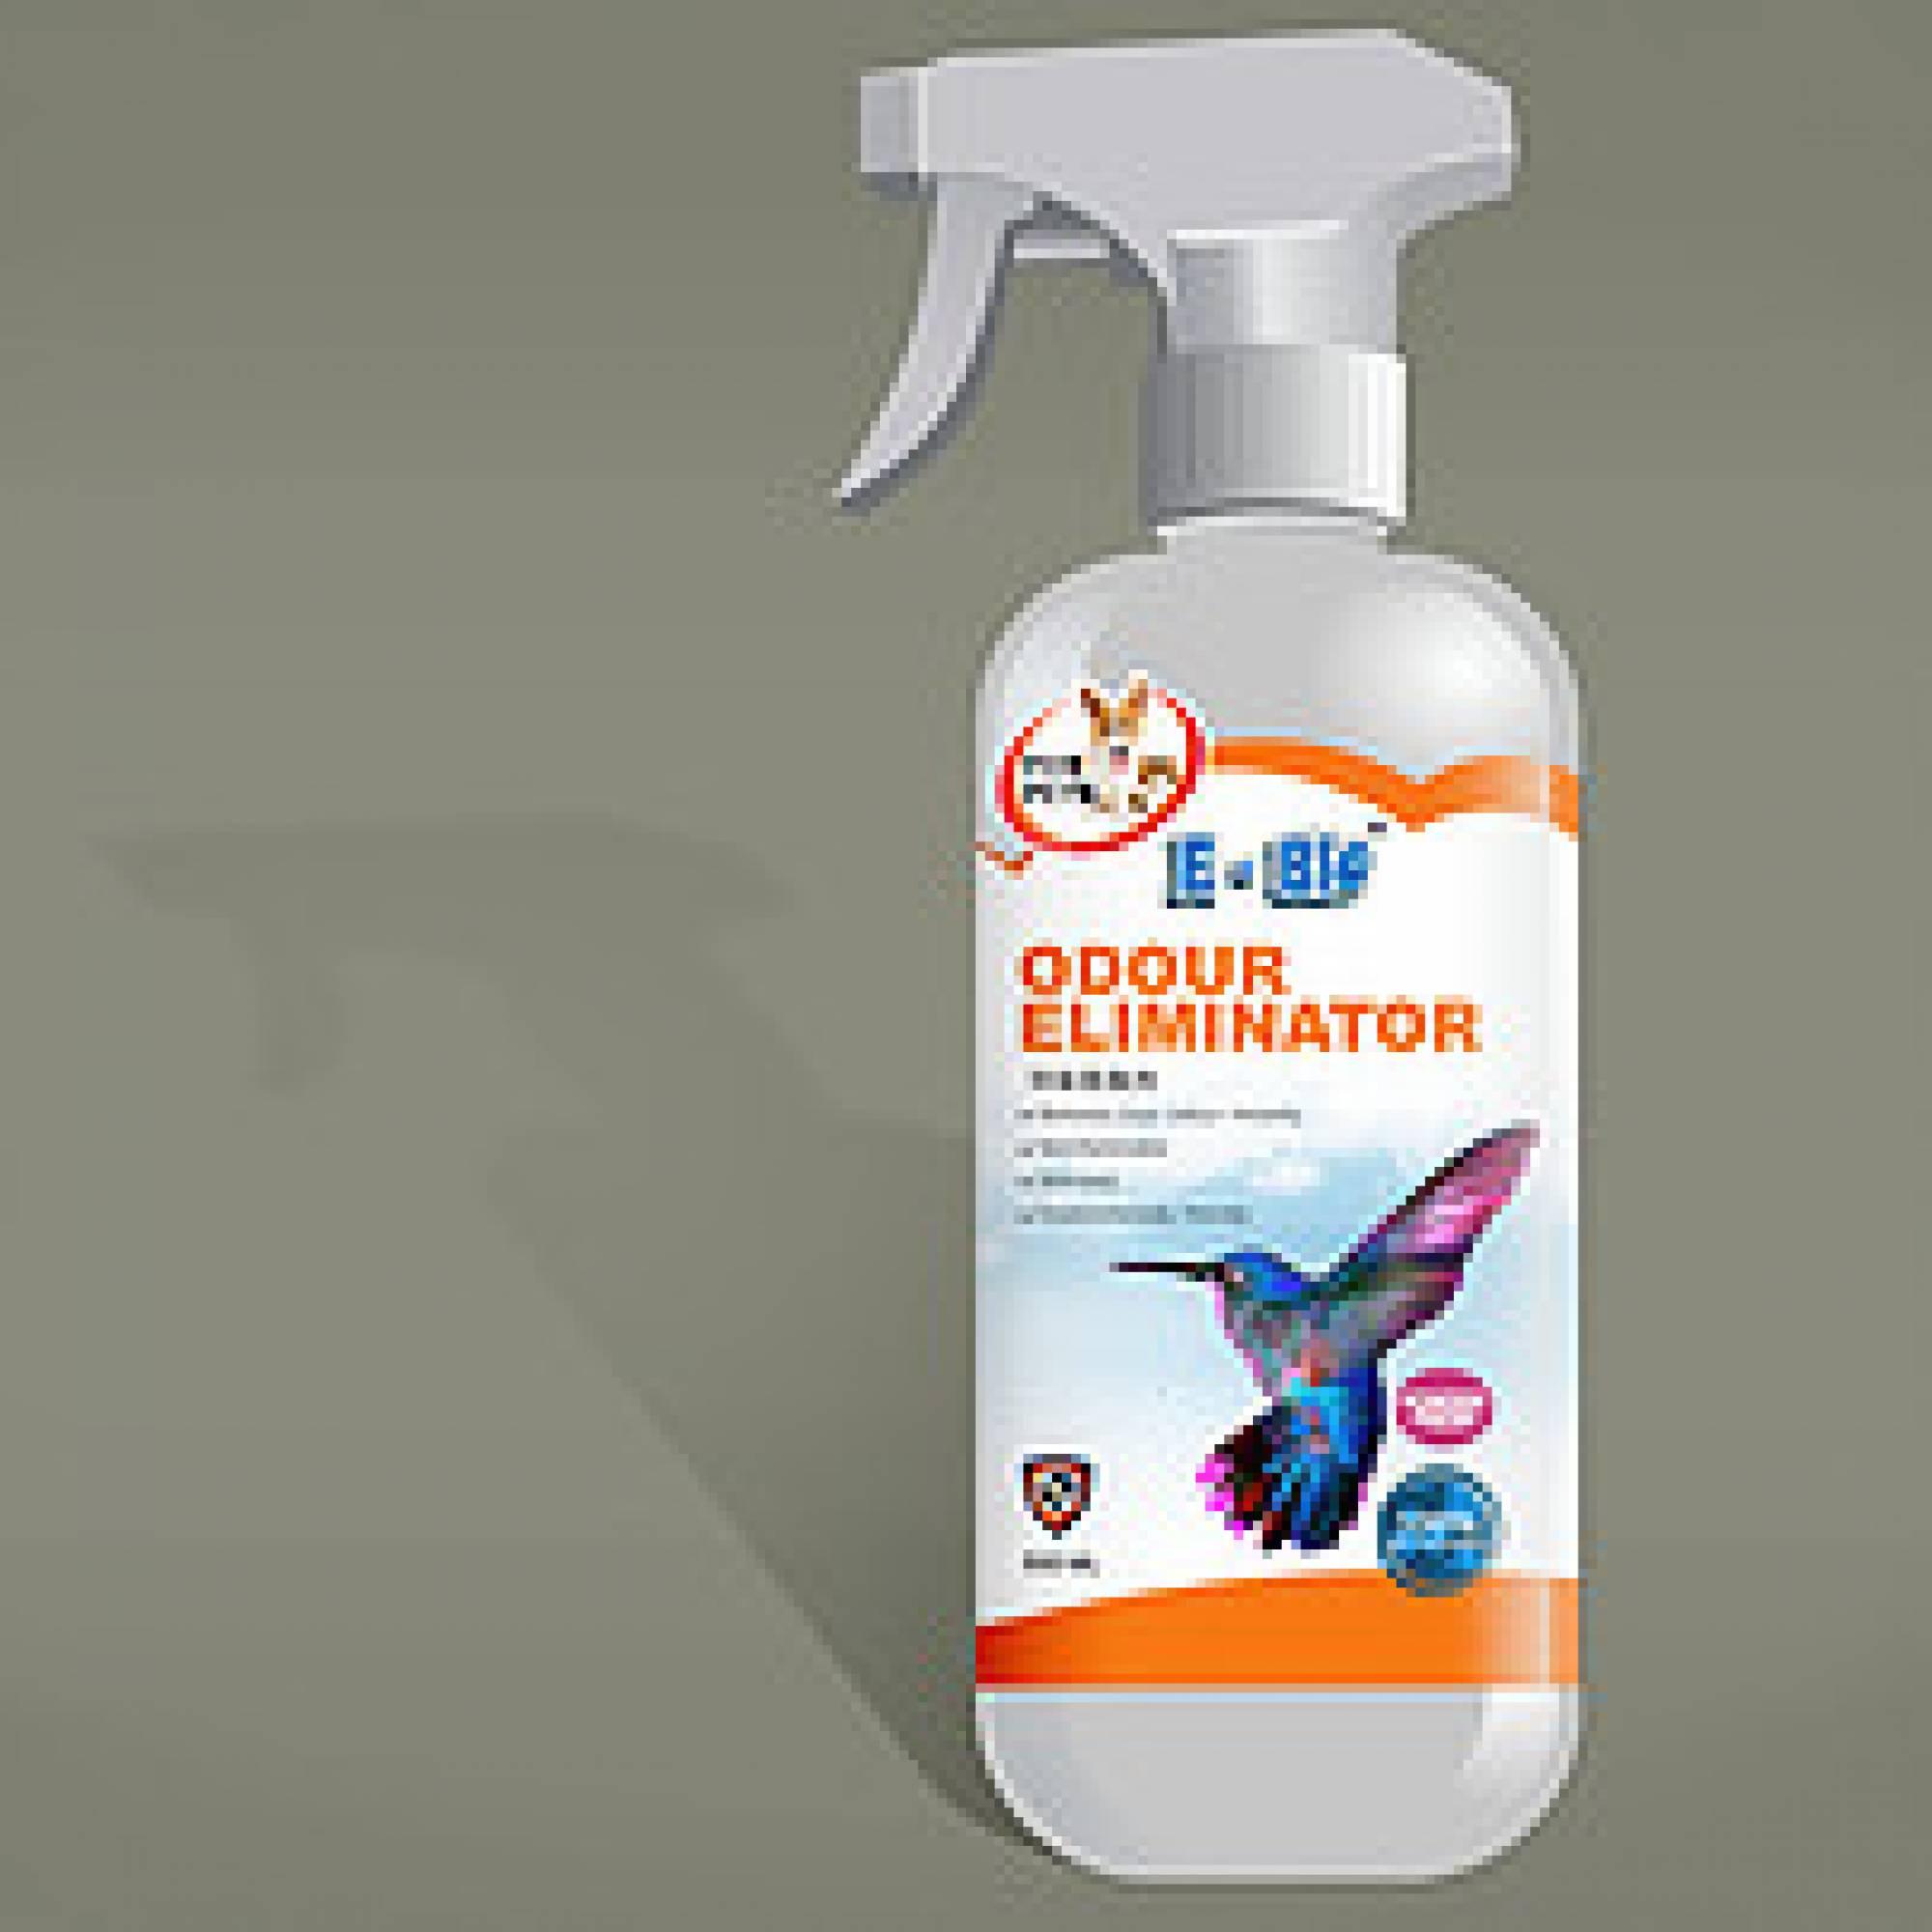 E-Bio Odour Eliminator (Powder Fresh) 500ml